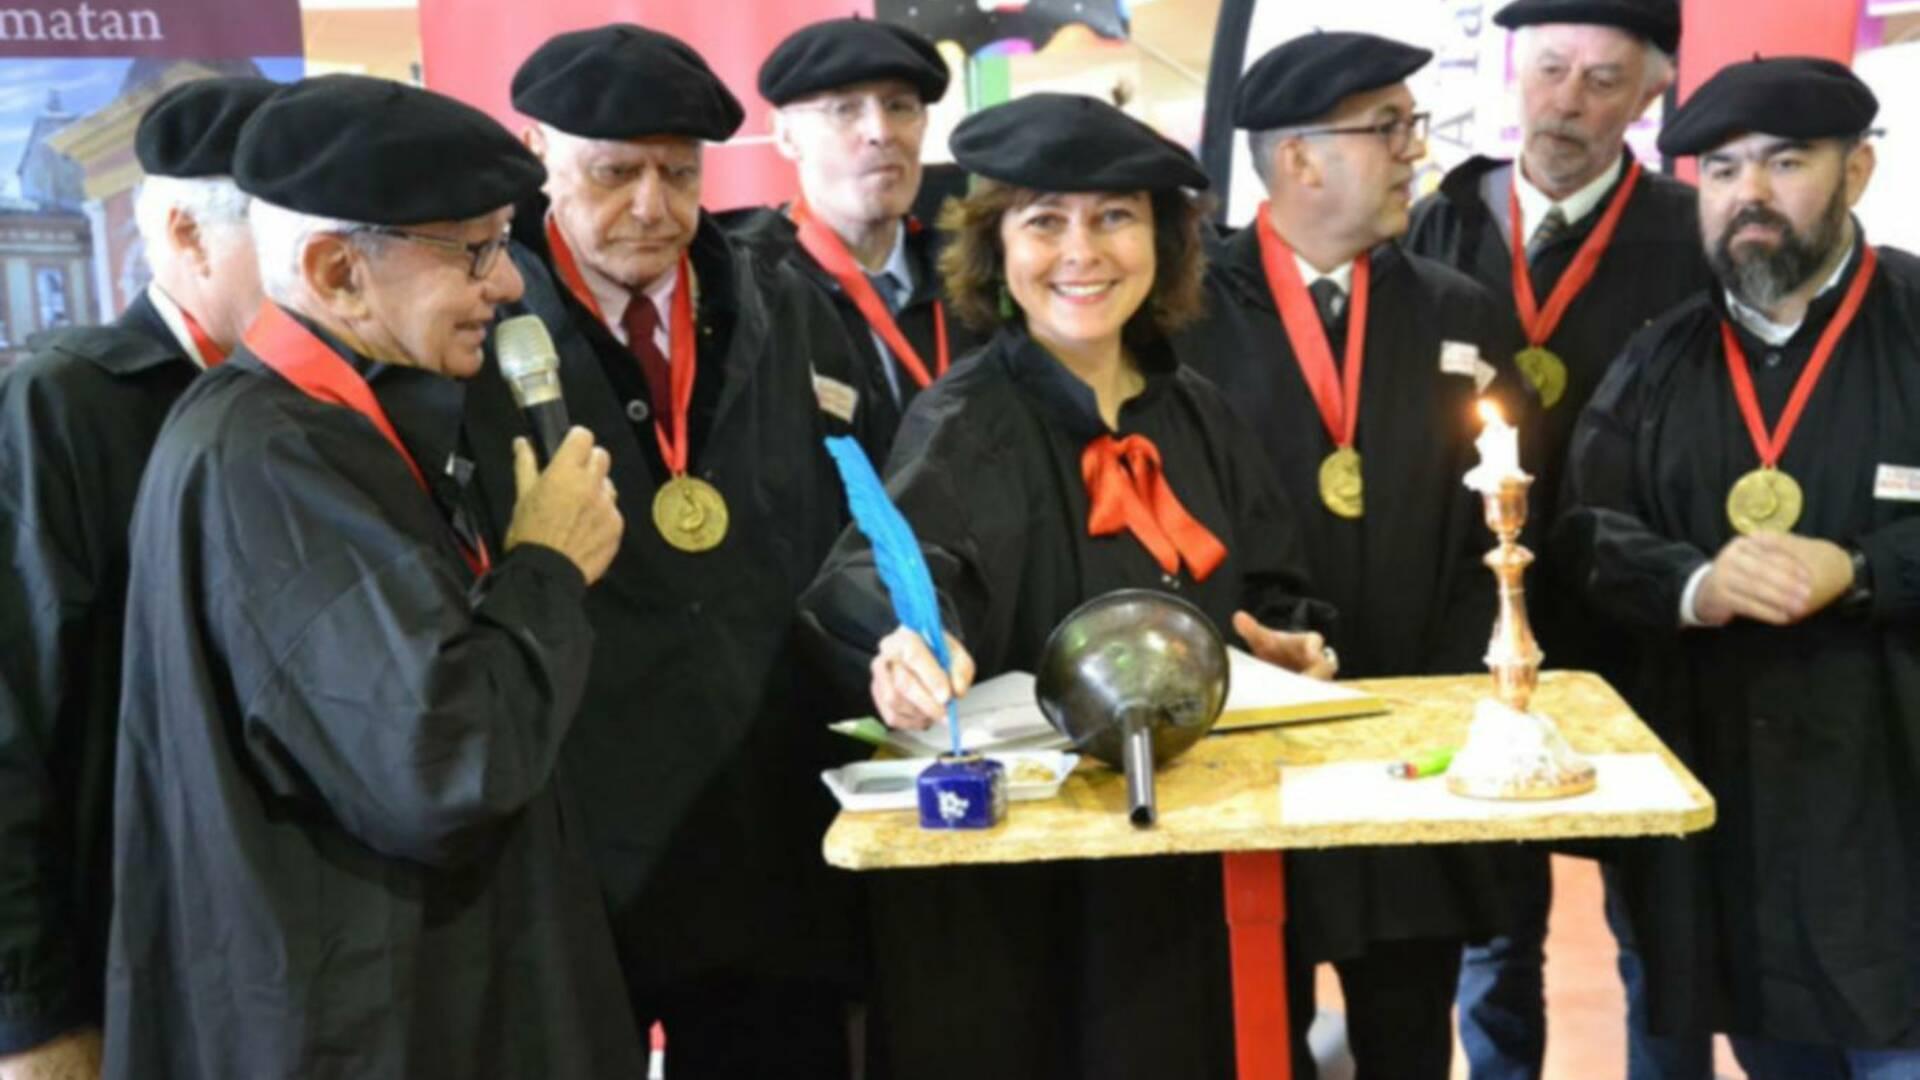 Carole Delga, Gasconh'a Table, Samatan, Lombez, Savès, Gers, Gascogne, France